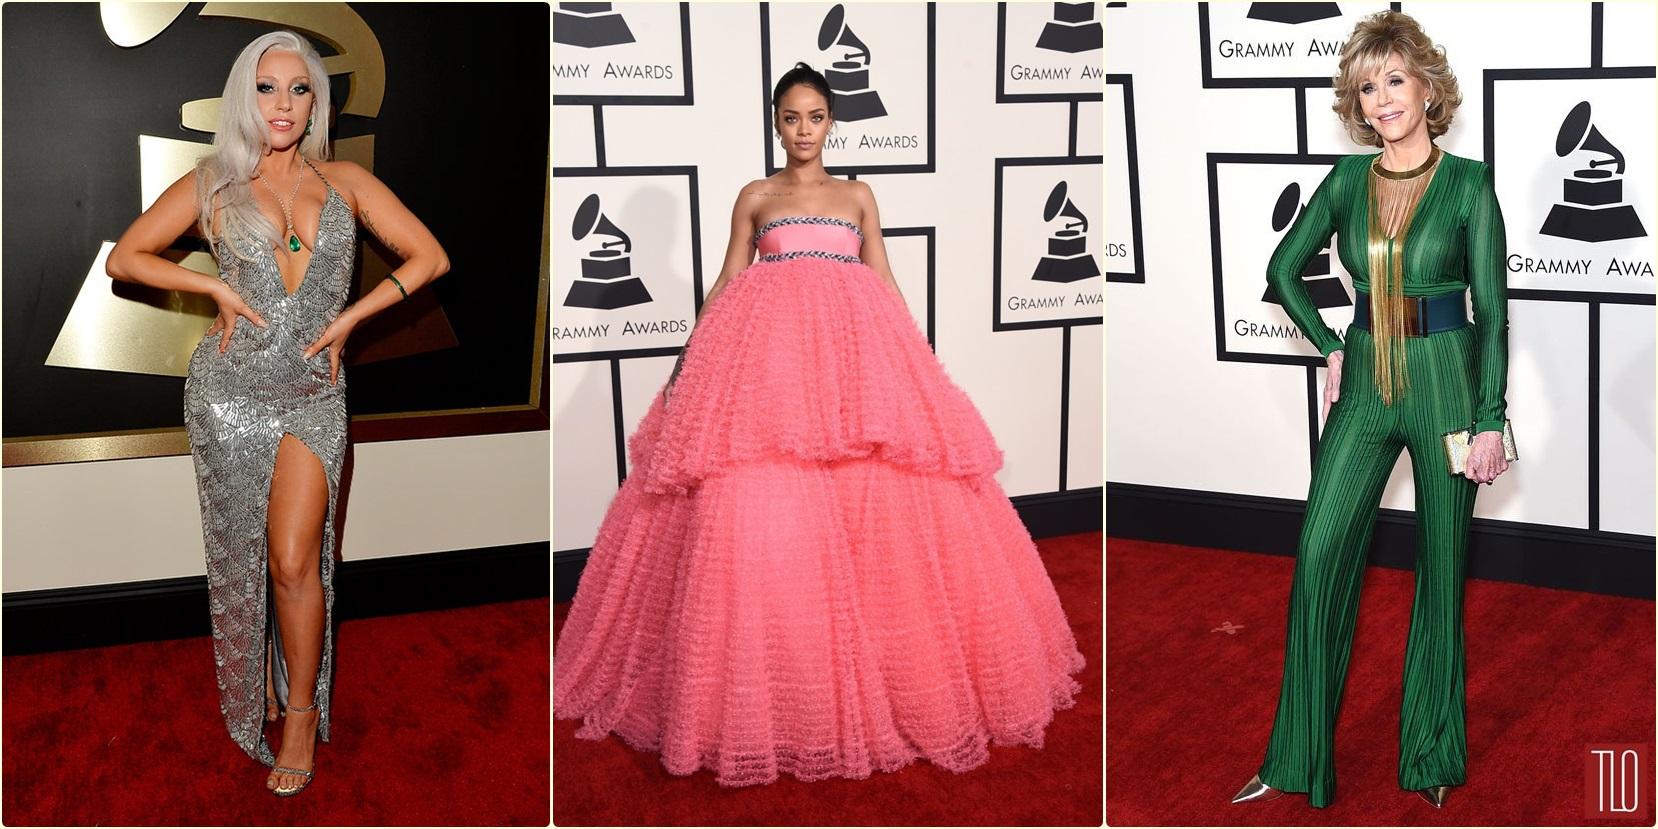 lady-gaga-grammy-2015-red-carpet-horz